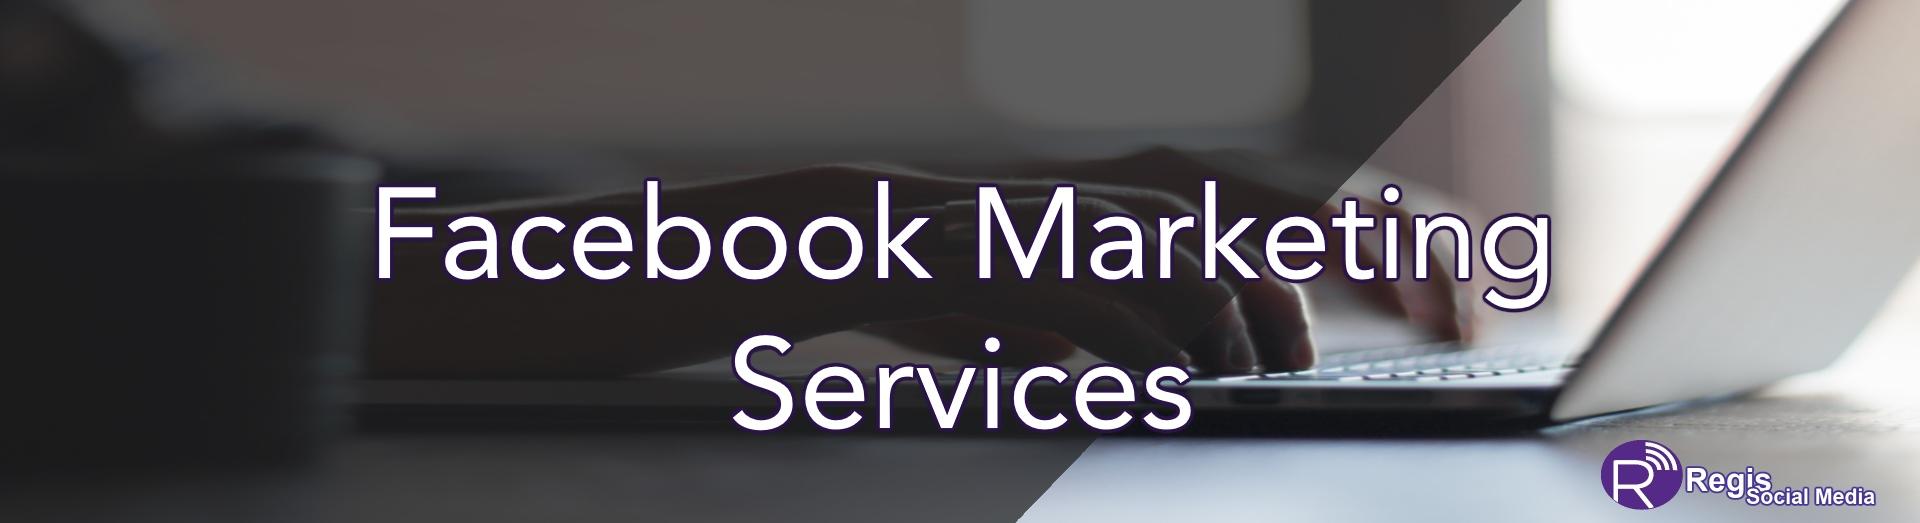 facebook marketing services banner